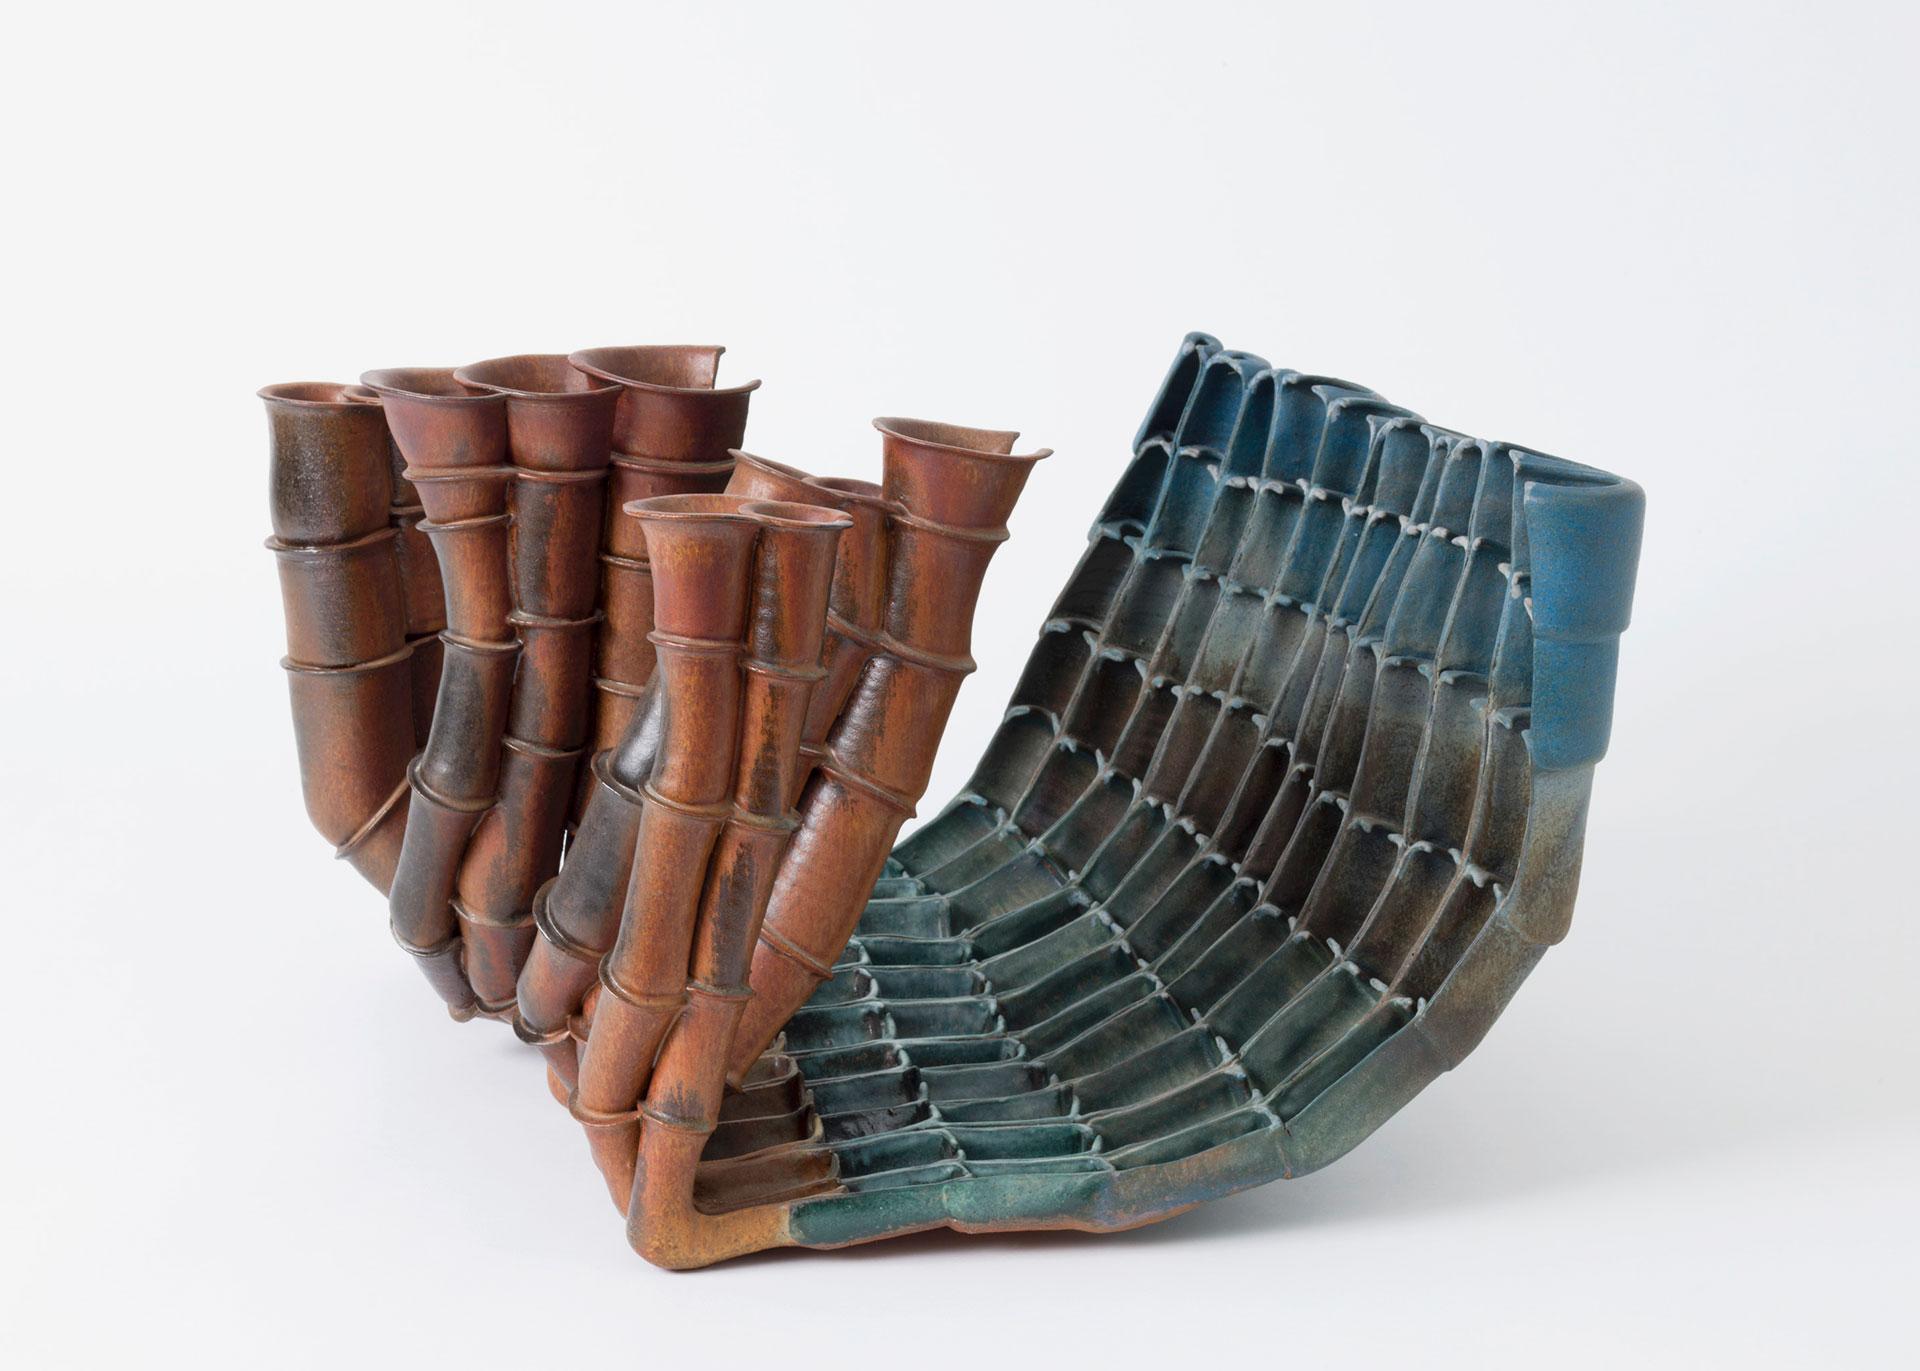 Beate Kuhn, Objekt, Bäume vor Himmel, Steinzeug, Keramik